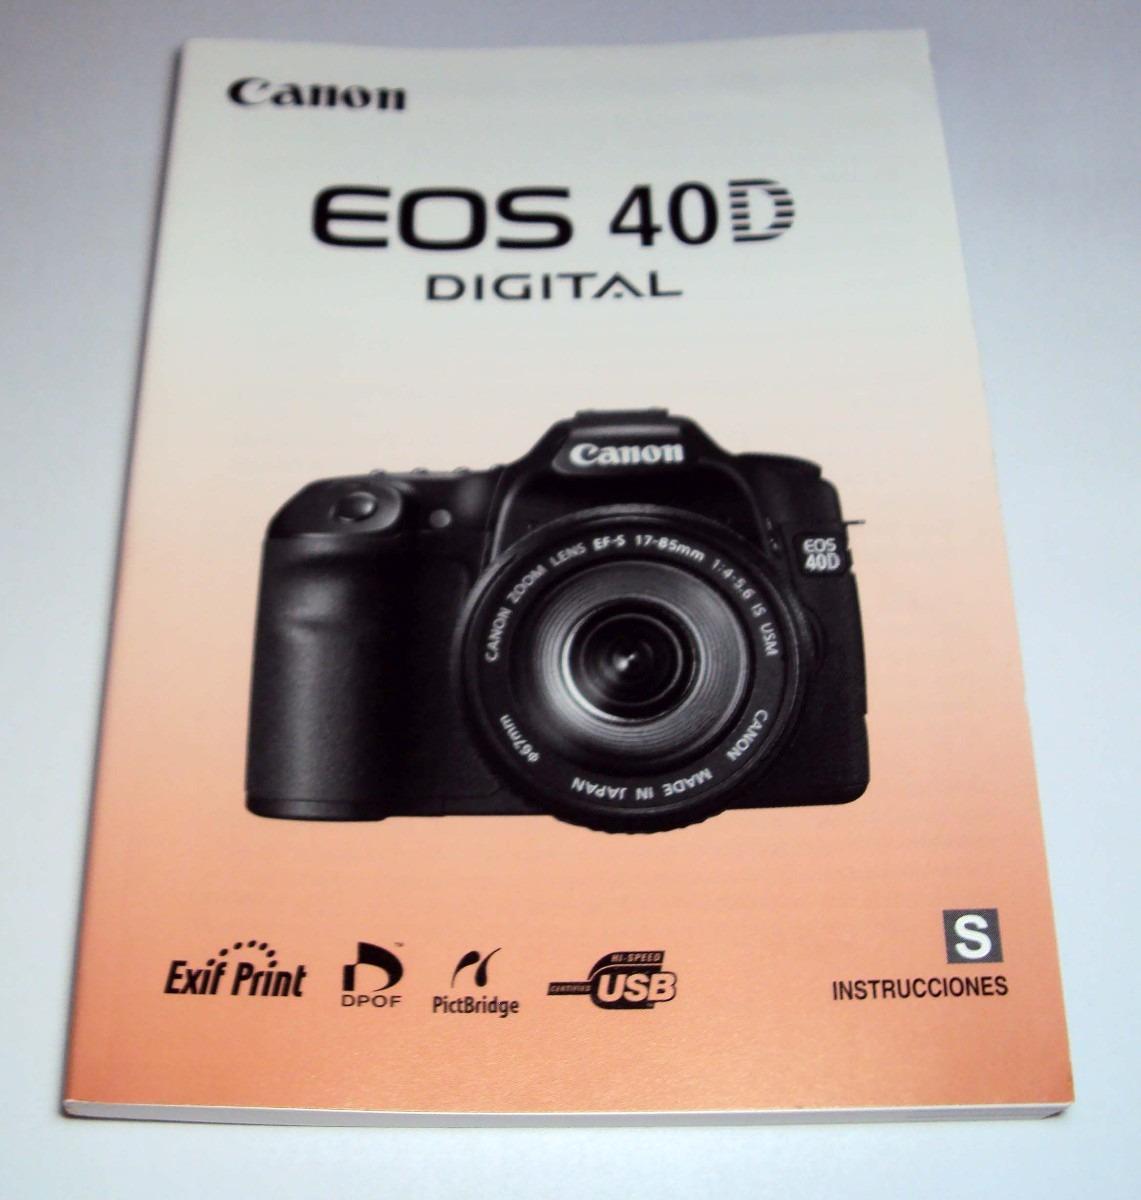 manual original canon eos 40d s ingles impr japao r 10 00 em rh produto mercadolivre com br EOS Rebel T5 vs 40D EOS-40D Flash Button